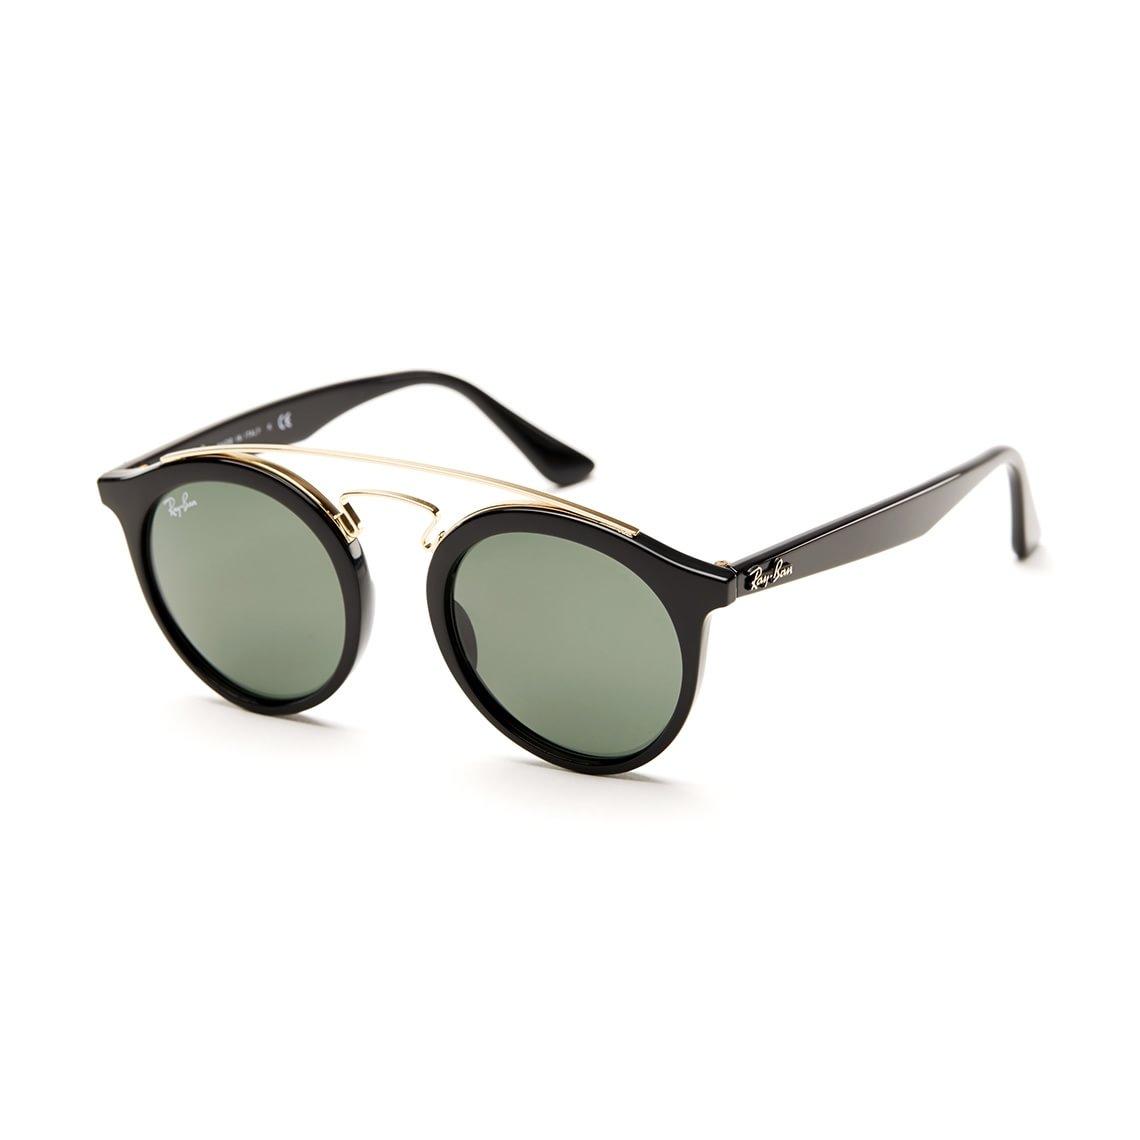 Gröna - Solglasögon - Synsam b093b397a884